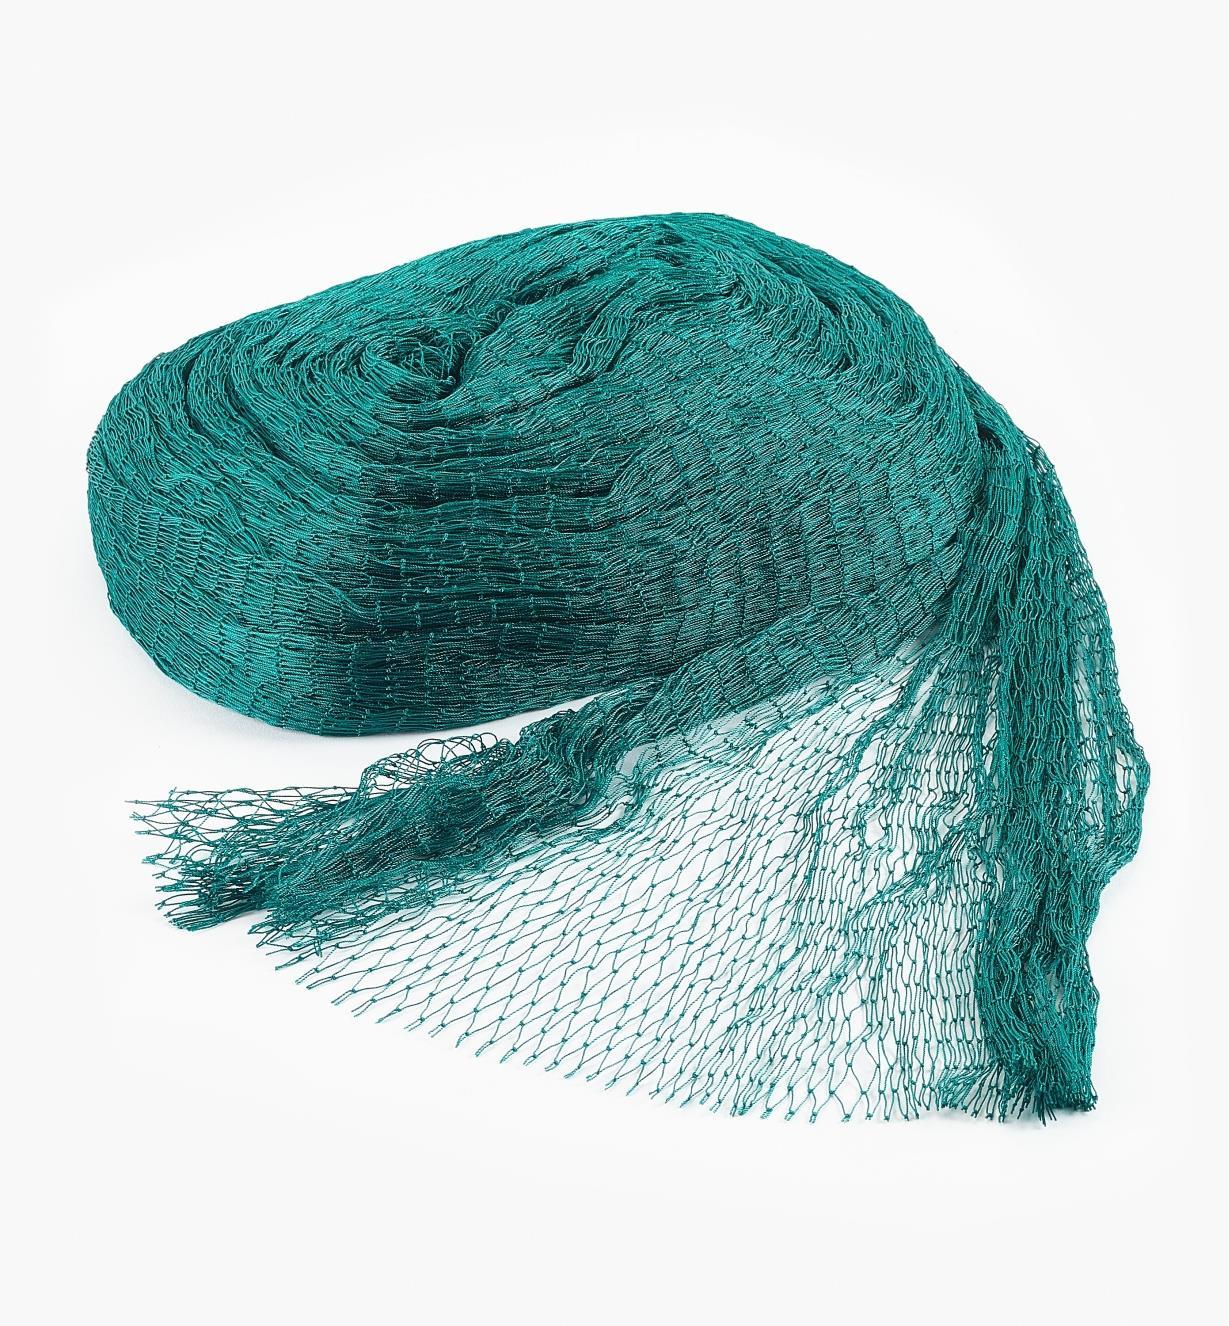 "PA205 - Netting, 12' x 29' (1/2"" mesh)"